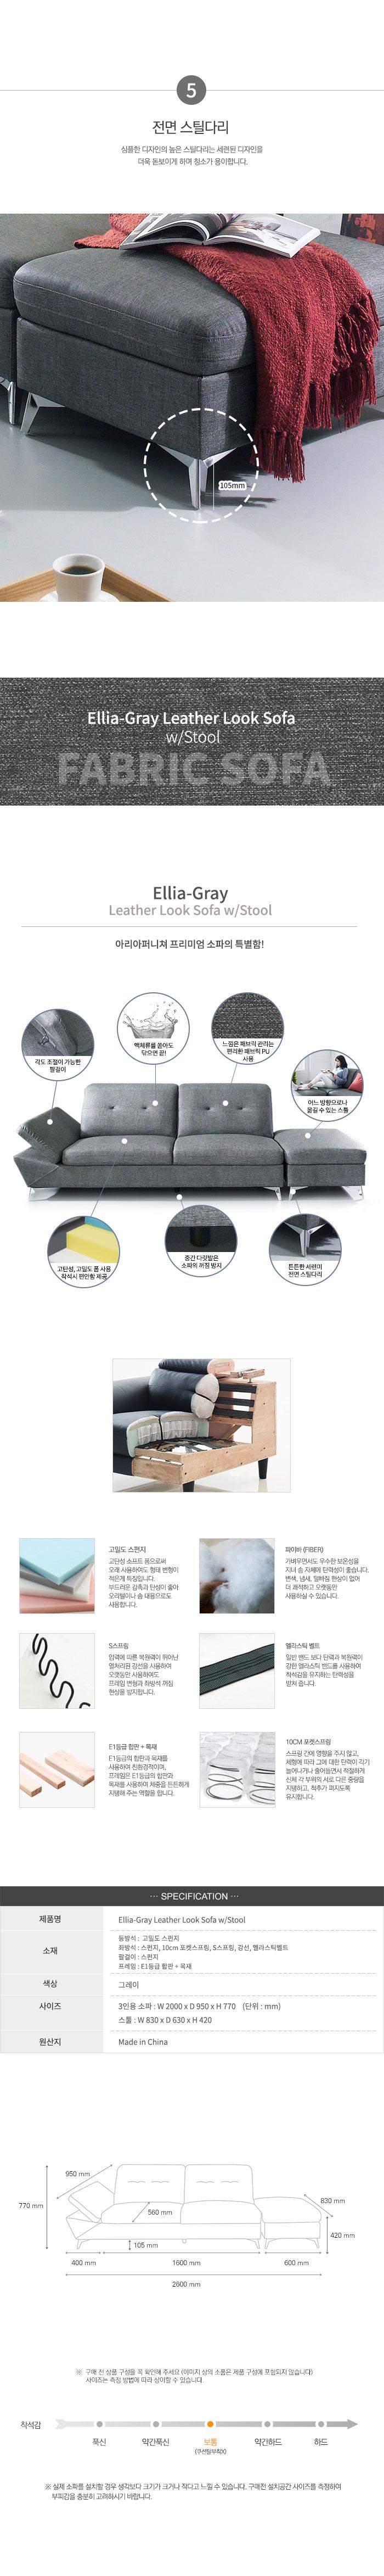 Ellia-Gray-Leather-Look-Sofa_3_180517.jp